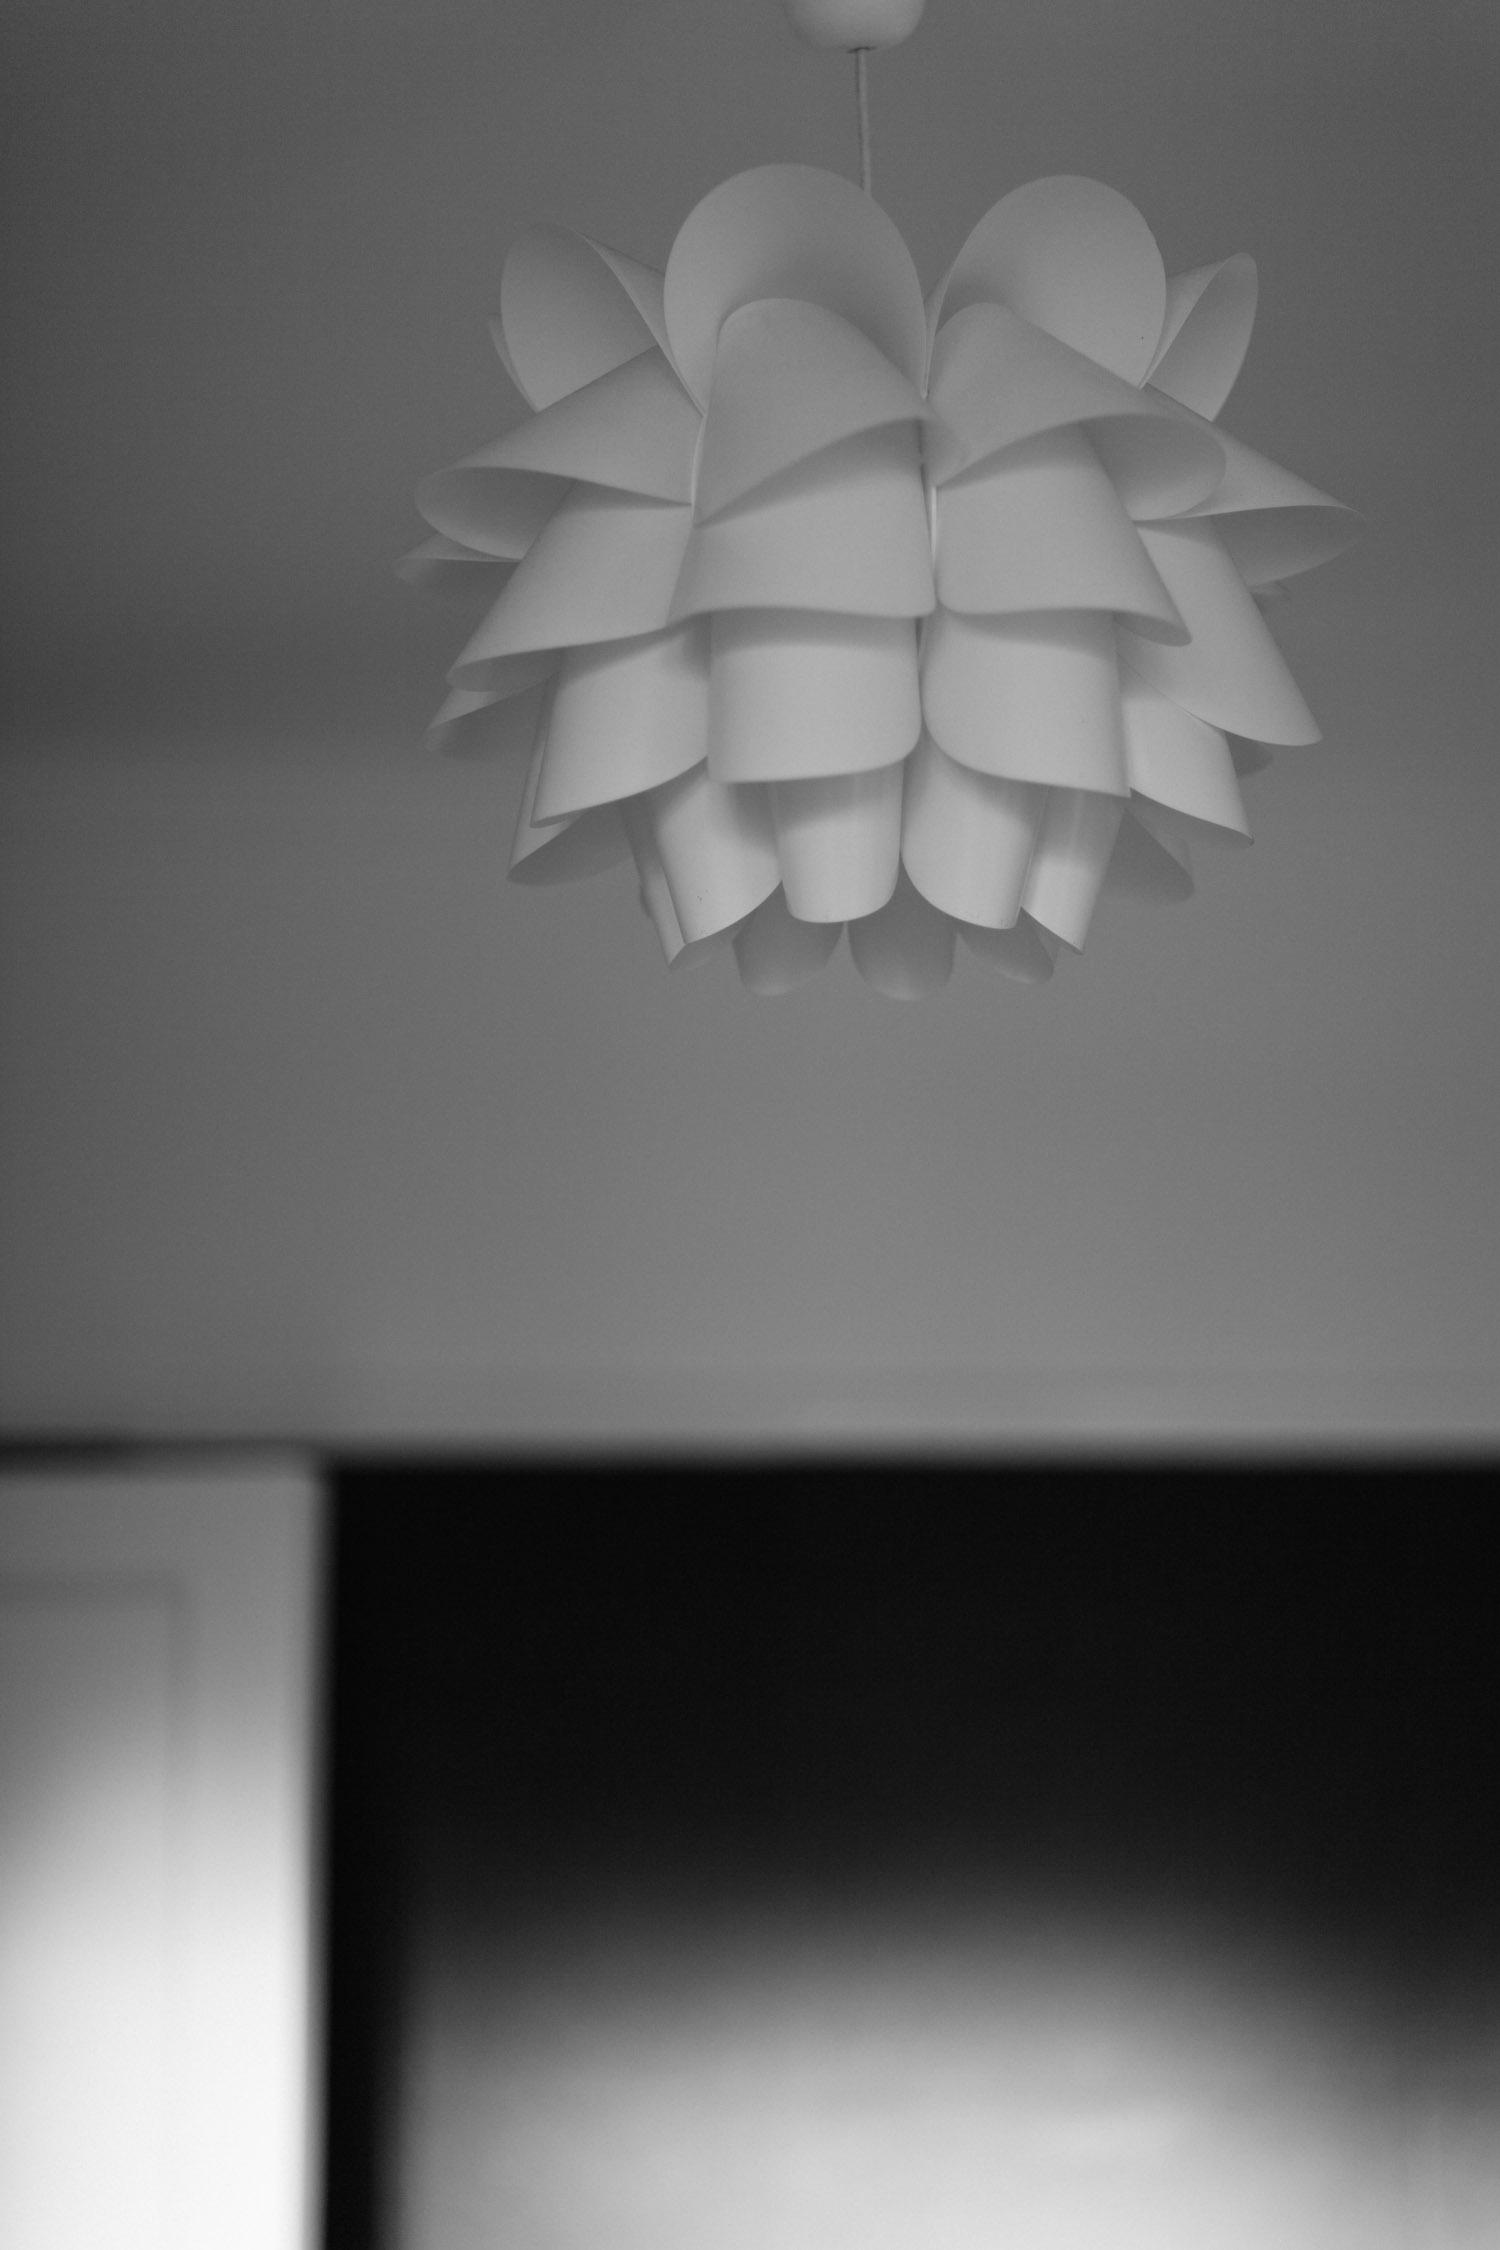 mornings_lightfixture-8826.jpg